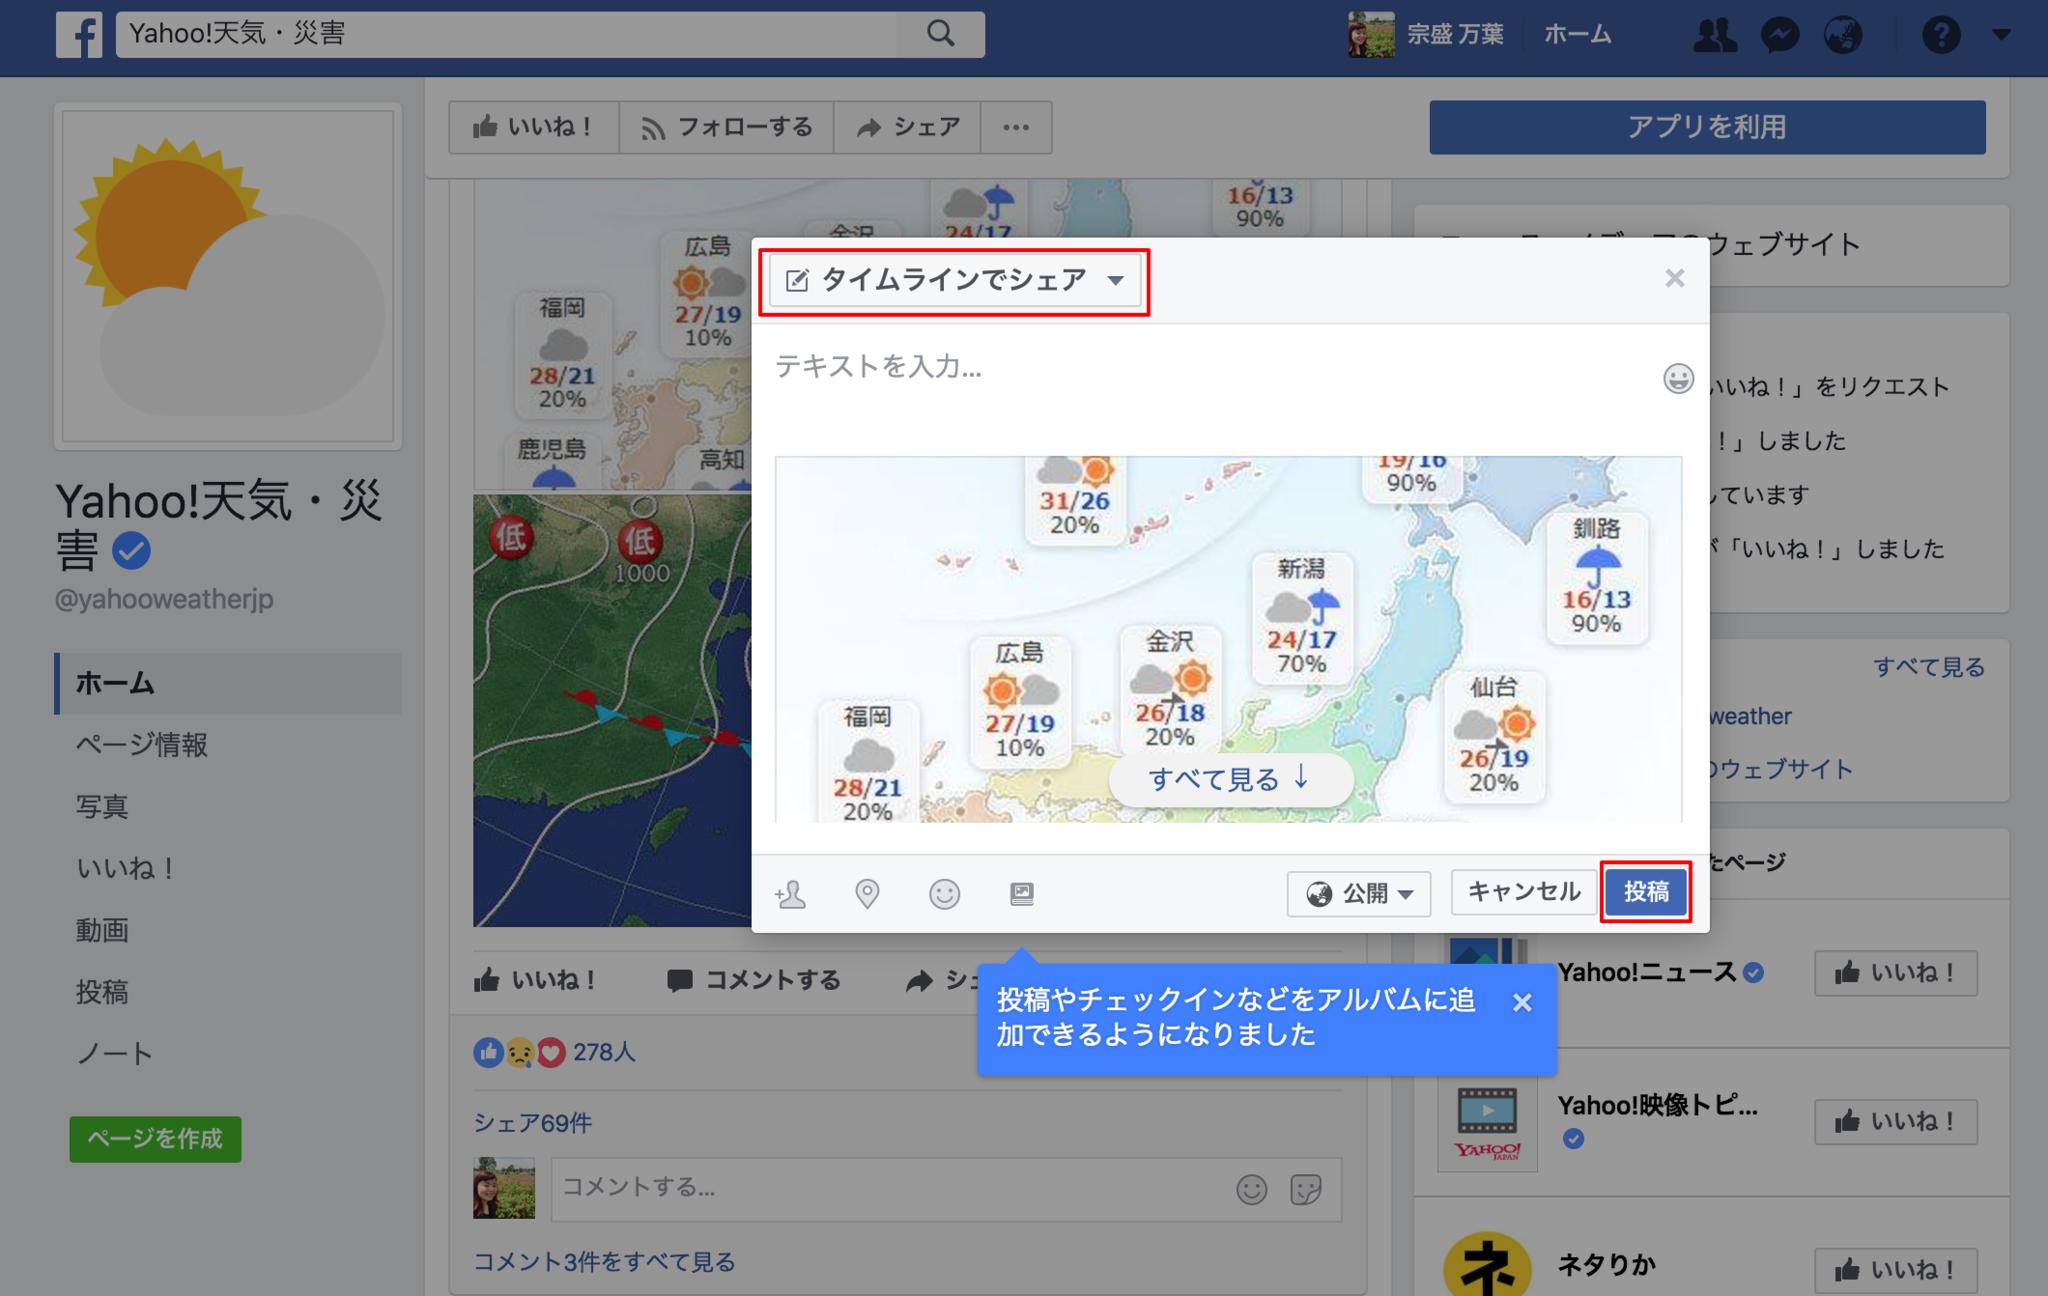 Yahoo_天気・災害___ホーム_(3).png